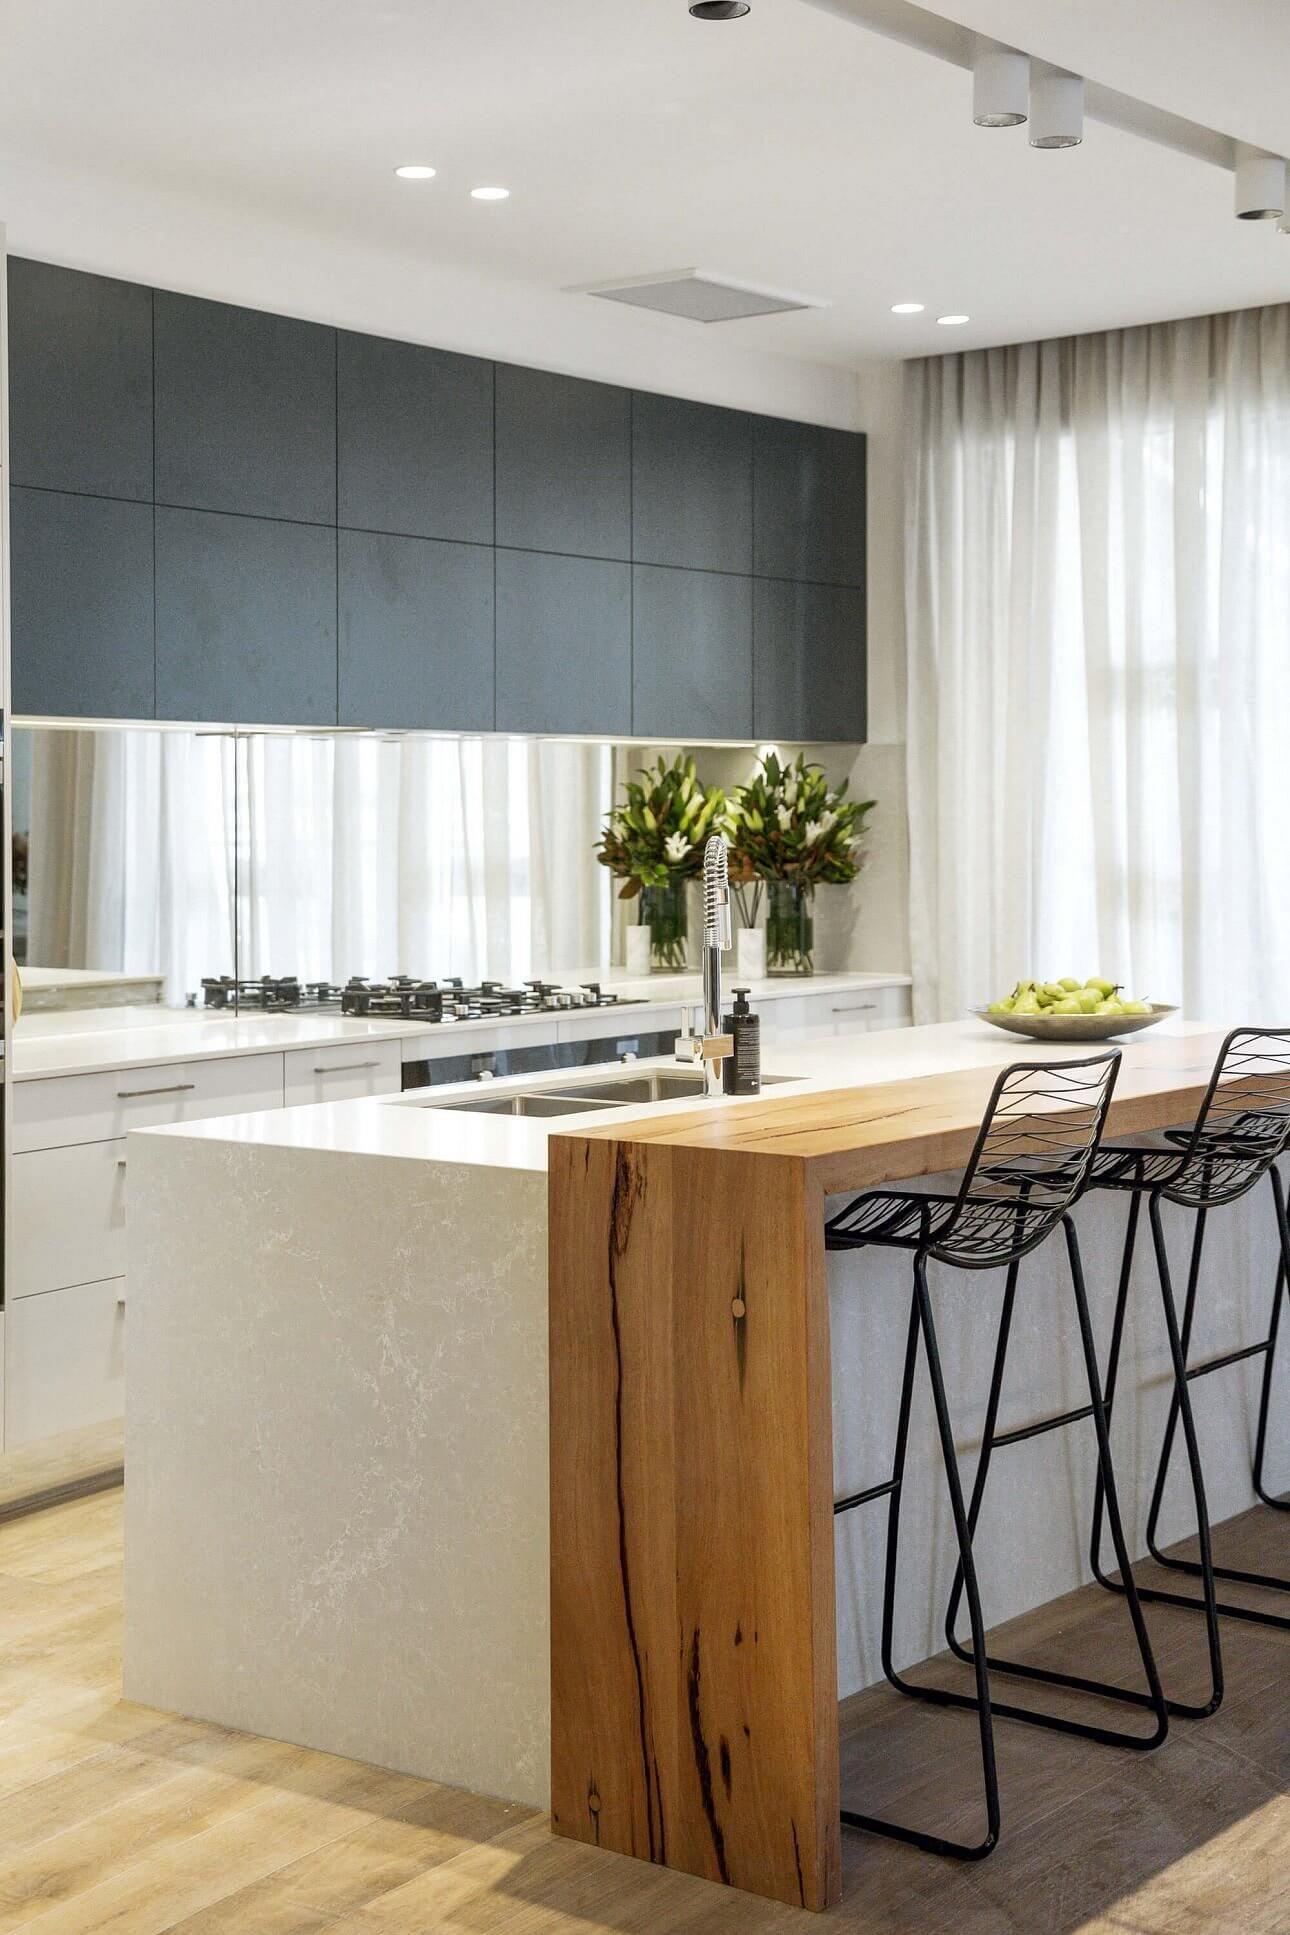 Natural Timber Breakfast Bar With Waterfall End Modern Kitchen Island Interior Design Kitchen Kitchen Living